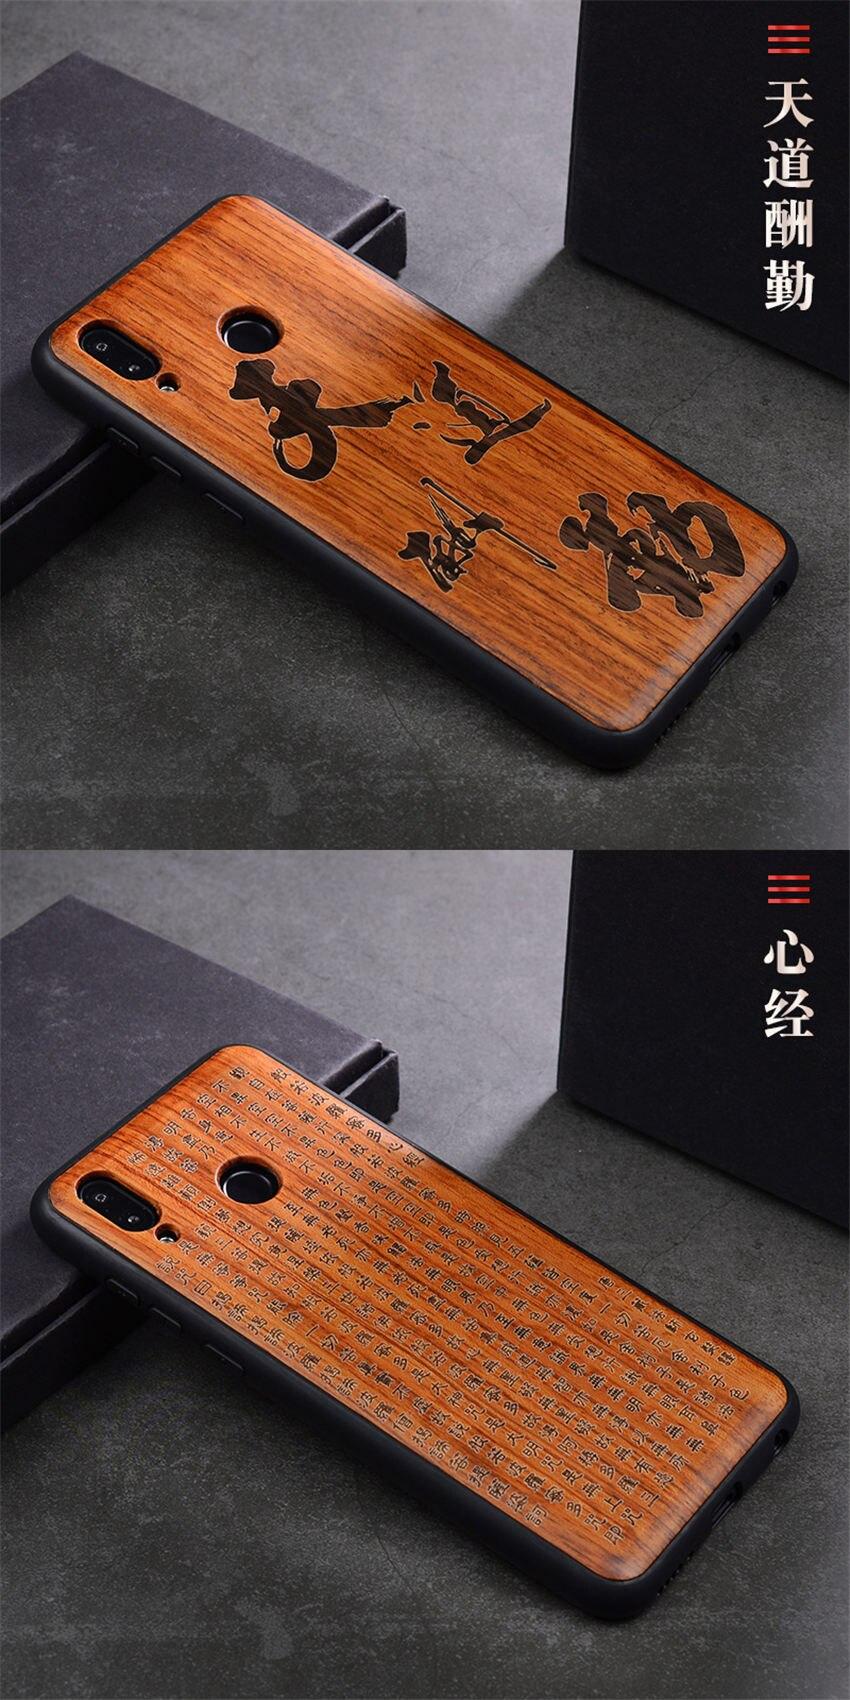 2018 New Huawei Honor 8x Case Slim Wood Back Cover TPU Bumper Case For Huawei Honor 8x Phone Cases Honor-8x (14)